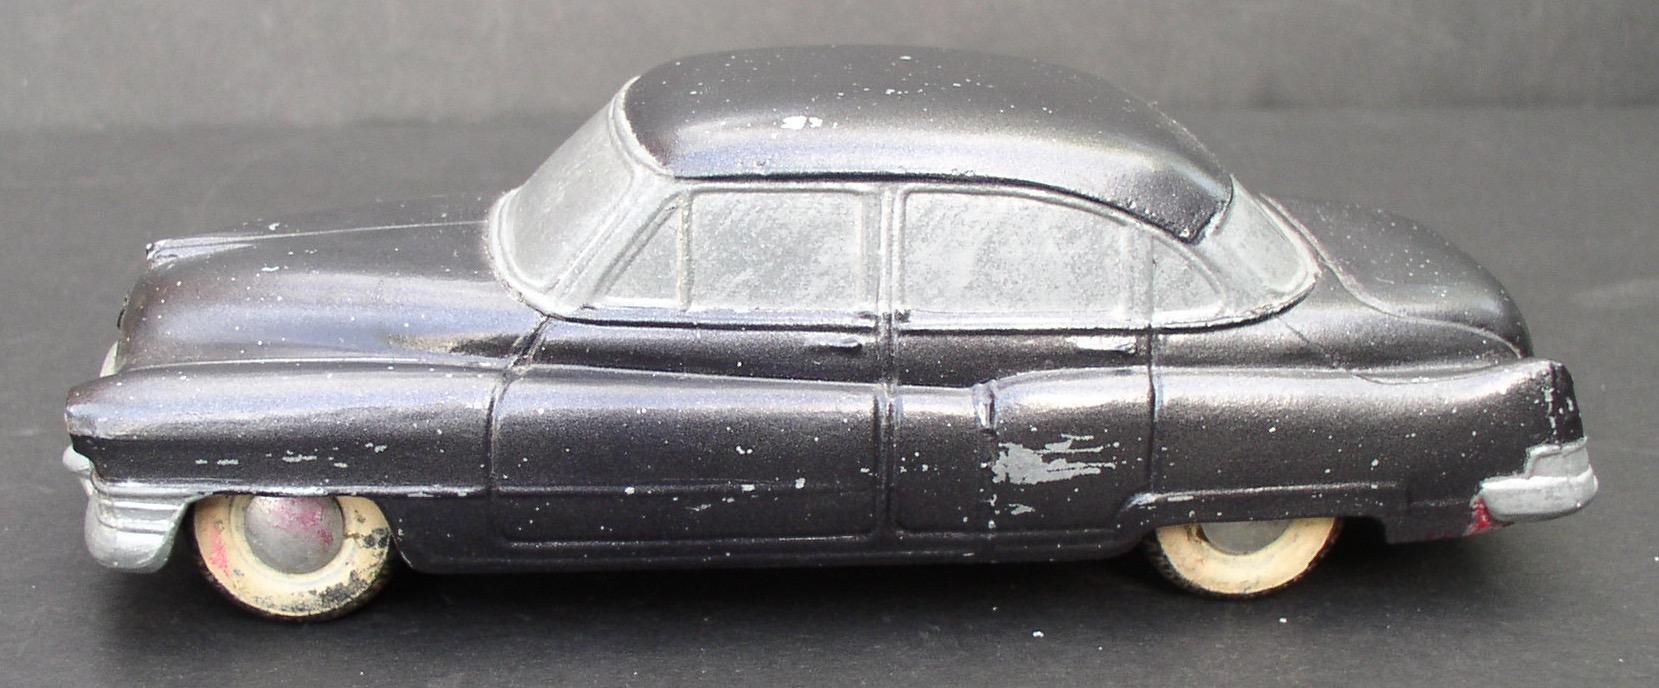 1952 Cadillac Fleetwood BANTHRICO Chicago ILL  Cast Steel Promo Car Bank